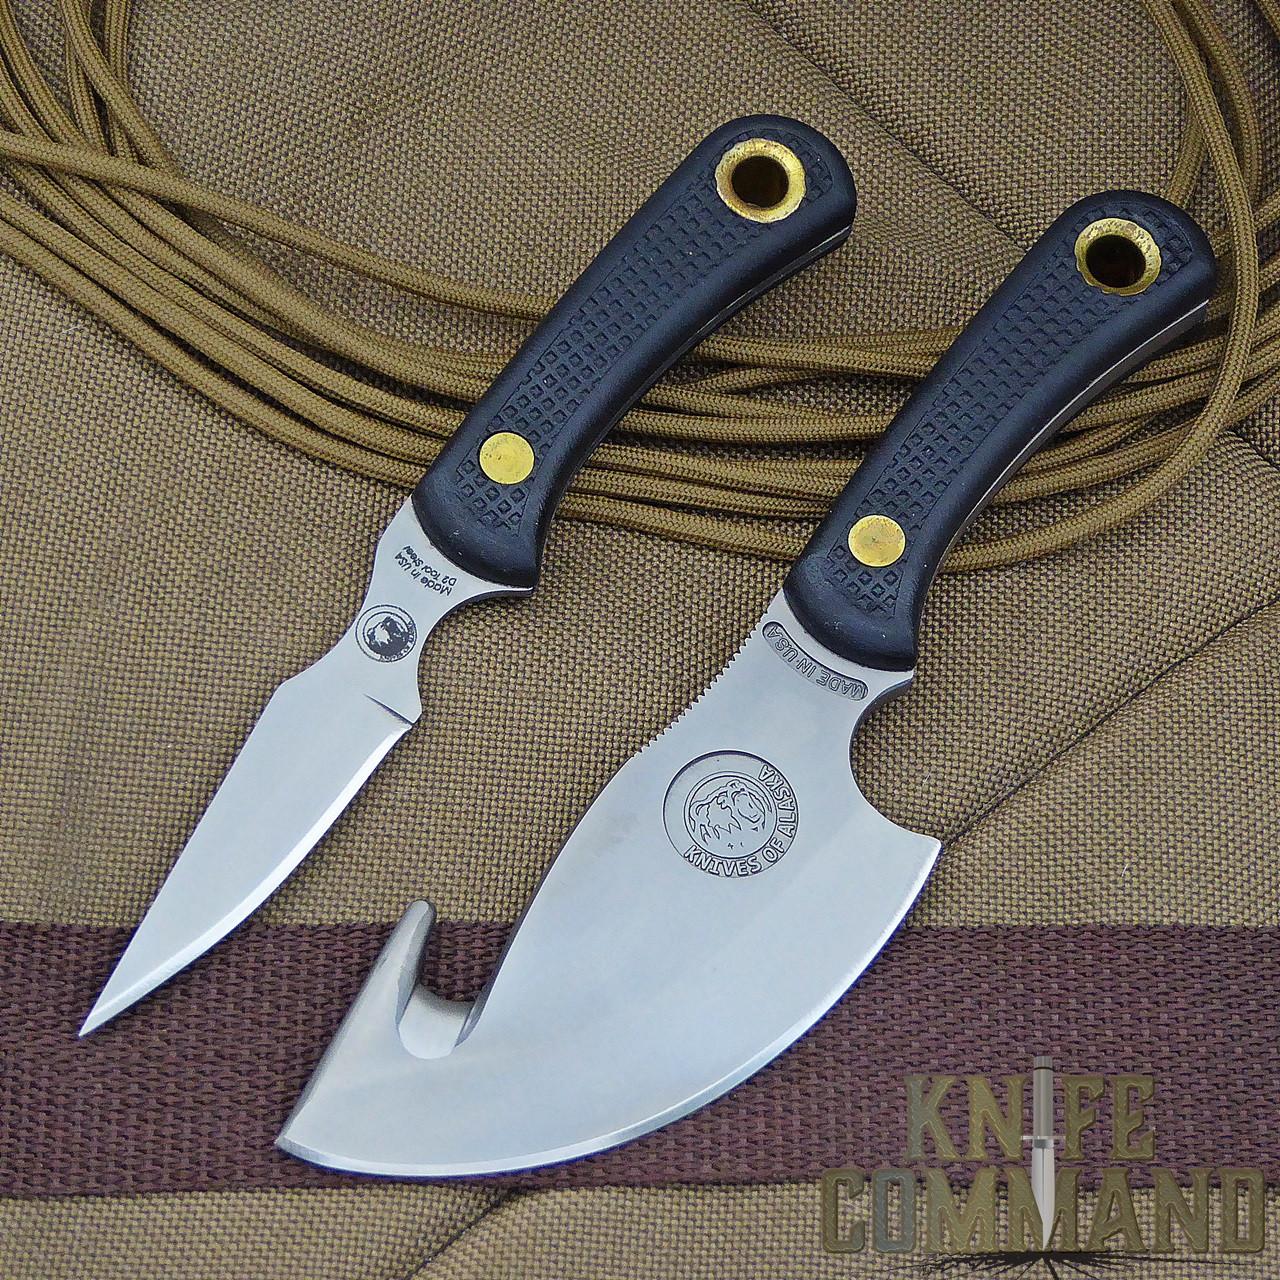 Knives of Alaska Light Hunter Suregrip Hunting Knife Combo.  The preferred combo for medium sized game.